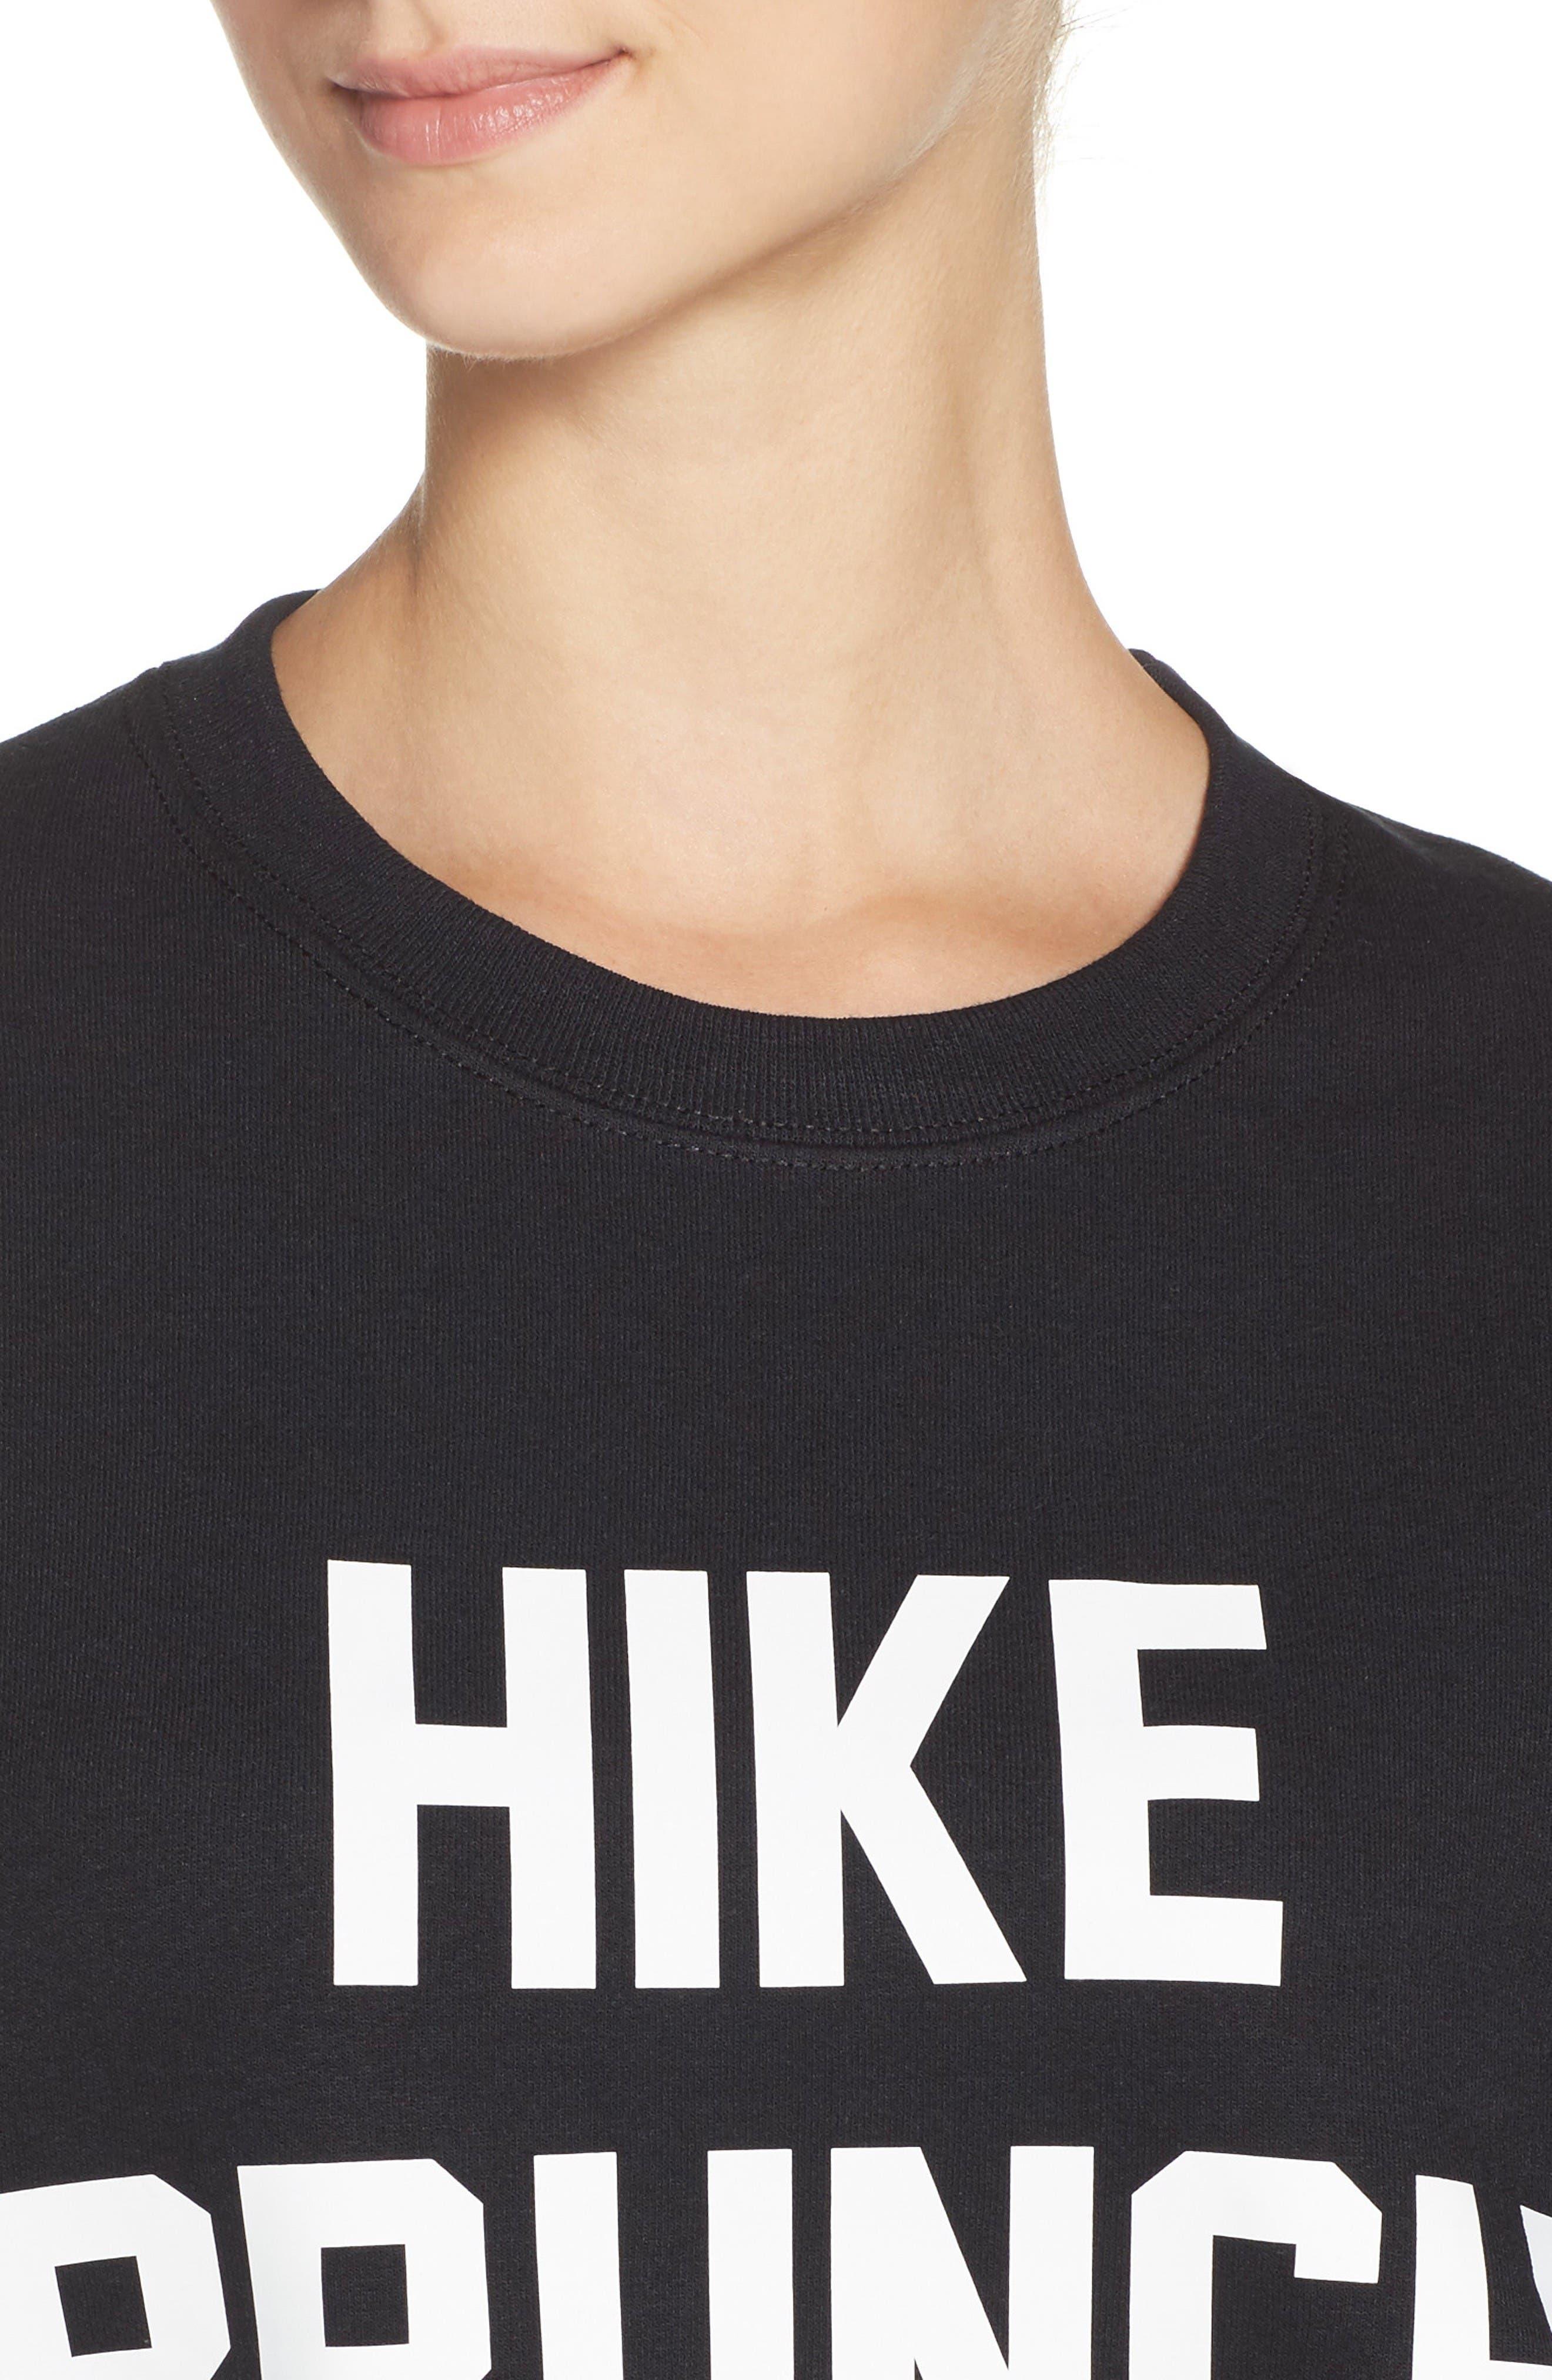 Alternate Image 4  - Private Party Hike Brunch Repeat Sweatshirt